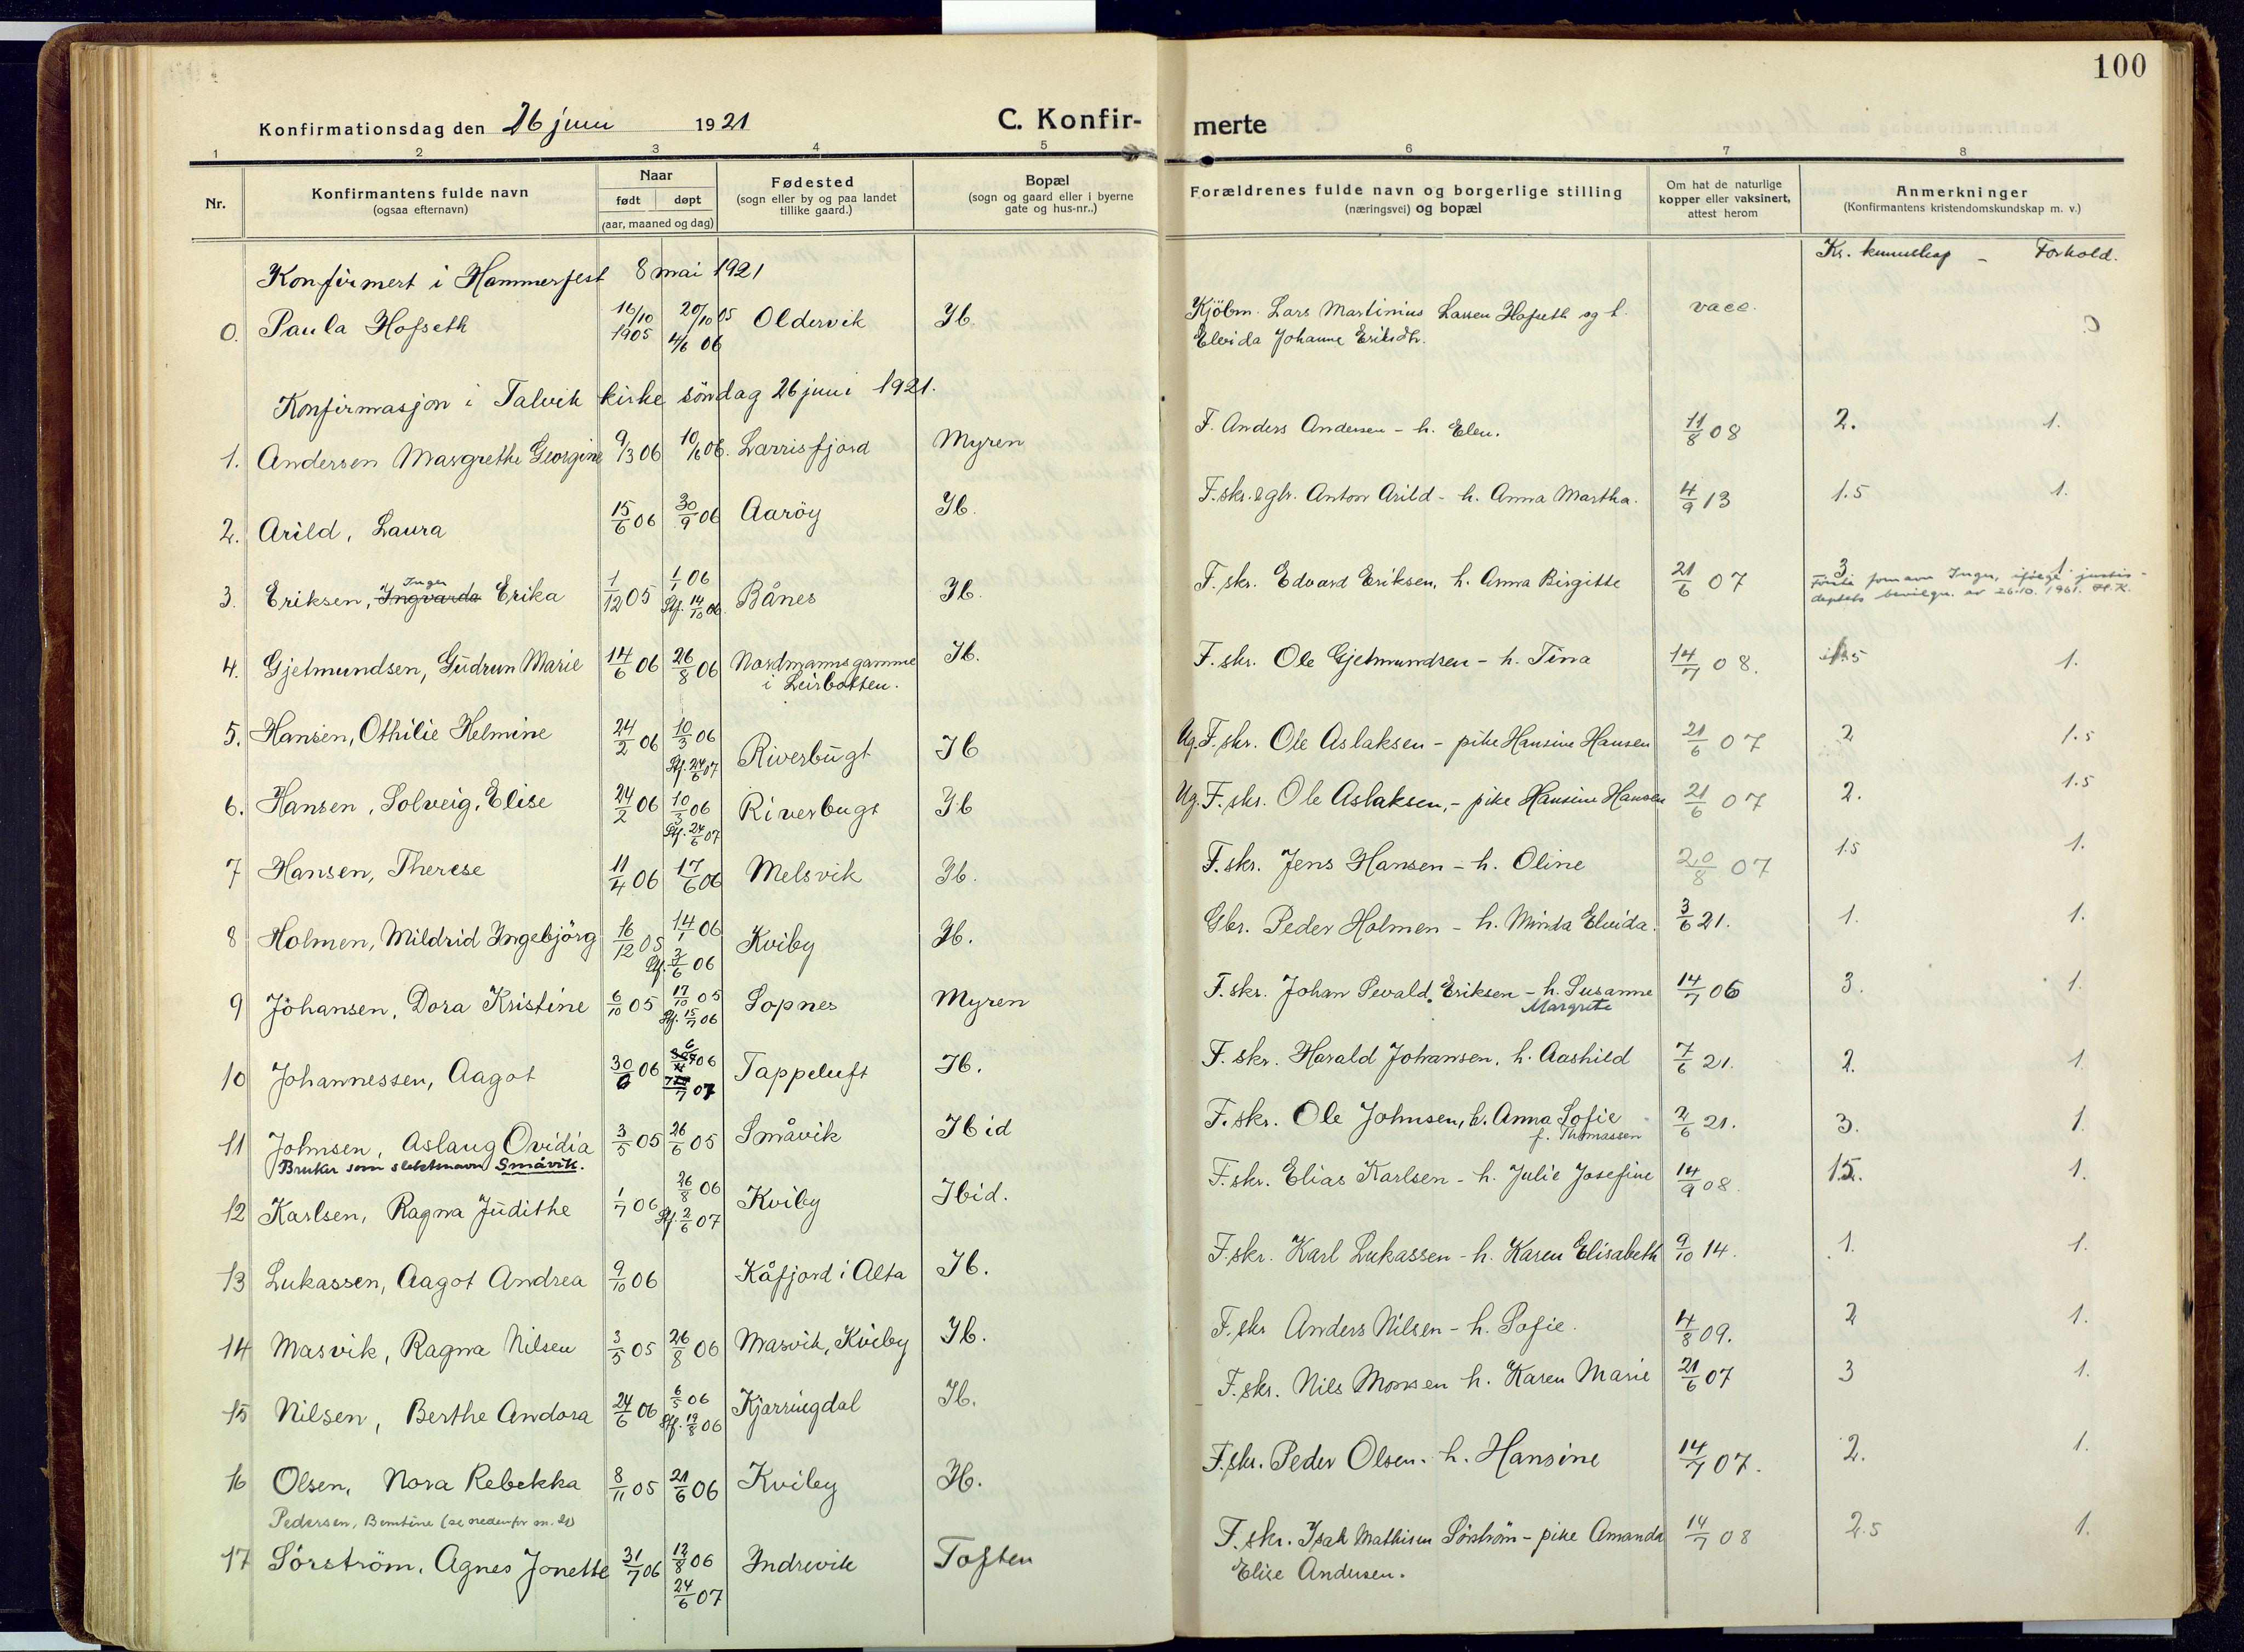 SATØ, Talvik sokneprestkontor, H/Ha/L0018kirke: Ministerialbok nr. 18, 1915-1924, s. 100